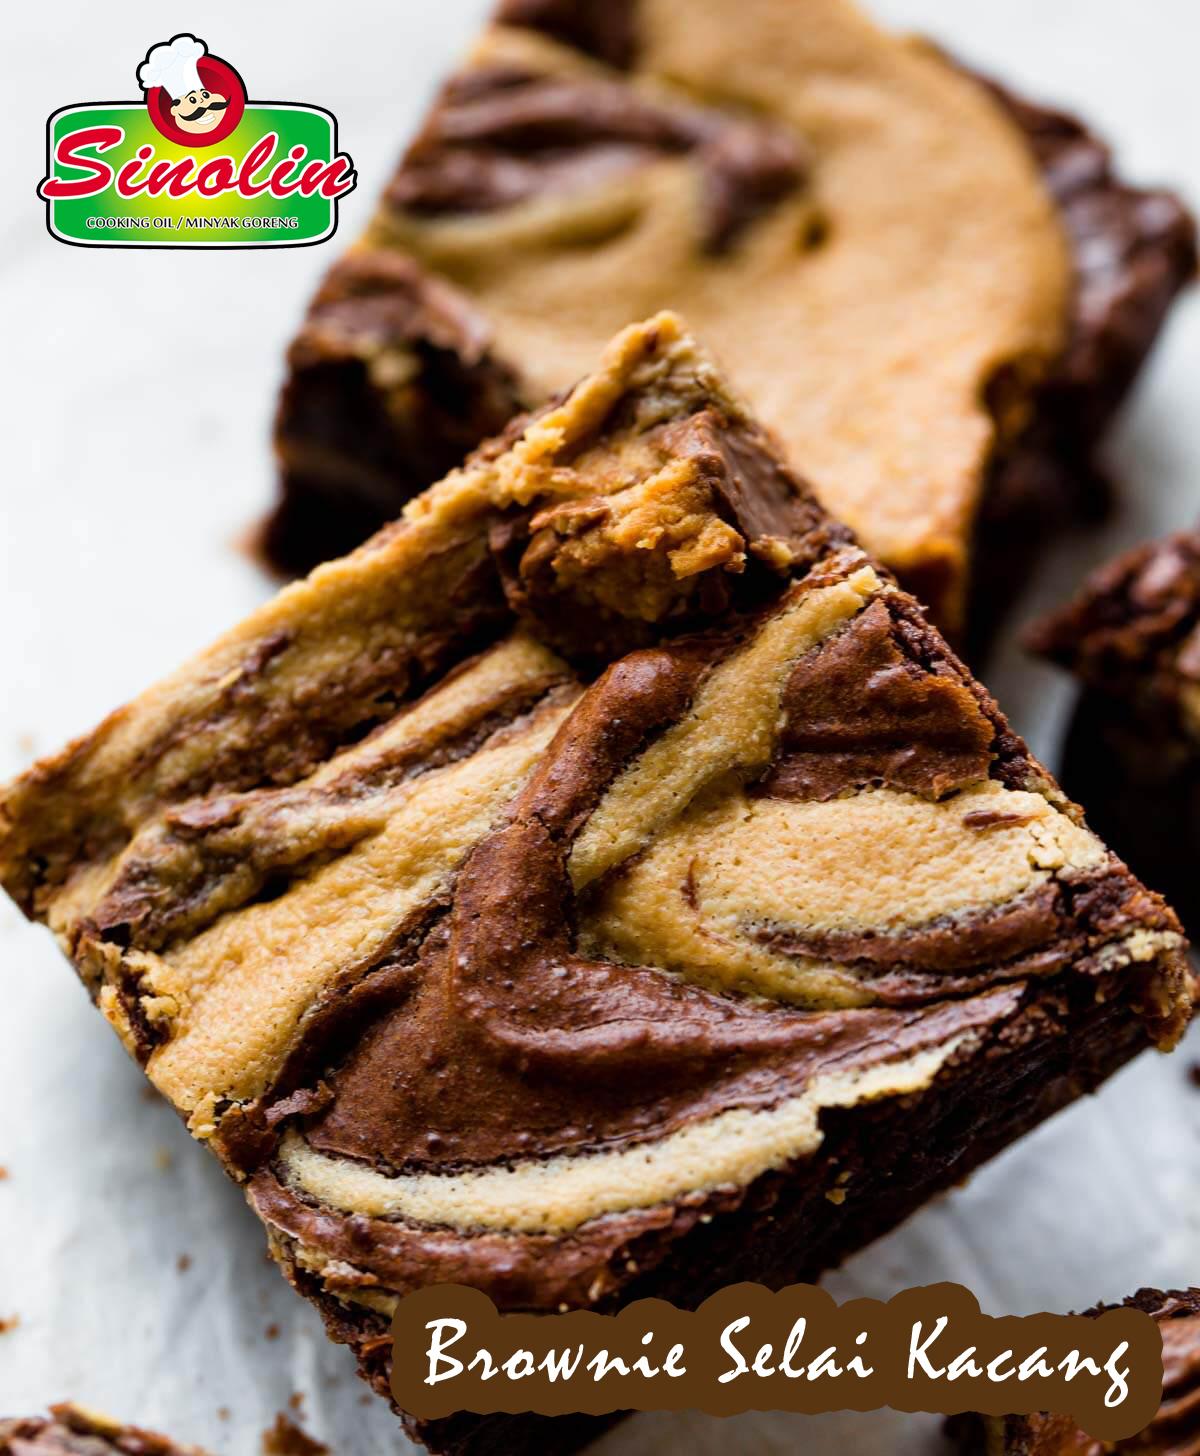 Brownie Selai Kacang Oleh Dapur Sinolin